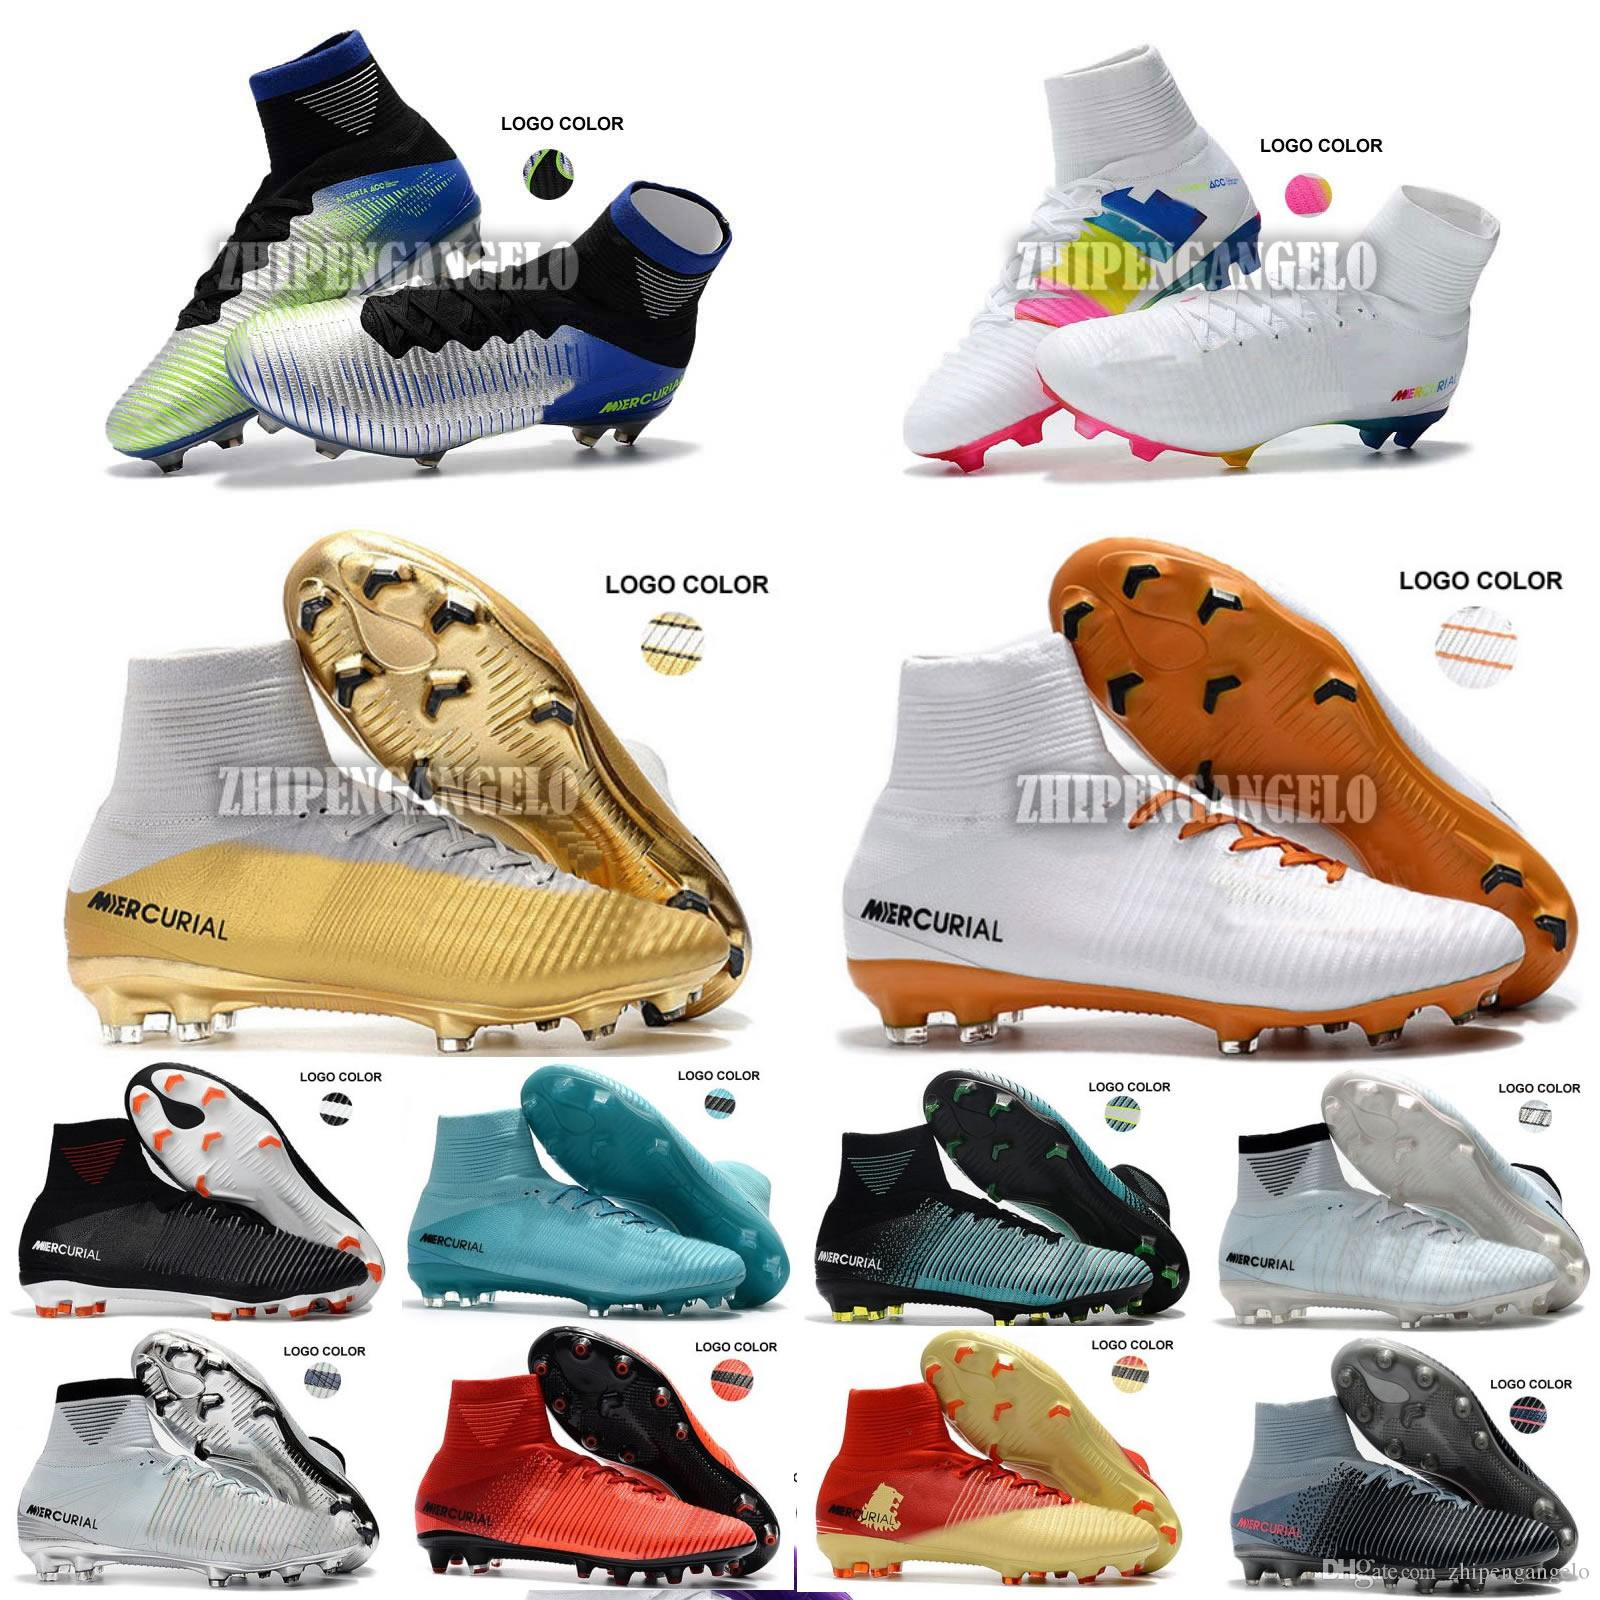 2018 Men Mercurial Superfly CR7 V FG AG Football Boots Cristiano Ronaldo  Neymar JR ACC Soccer Shoes Magista Obra Soccer Cleats Soccer Shoes Football  Cleats ...